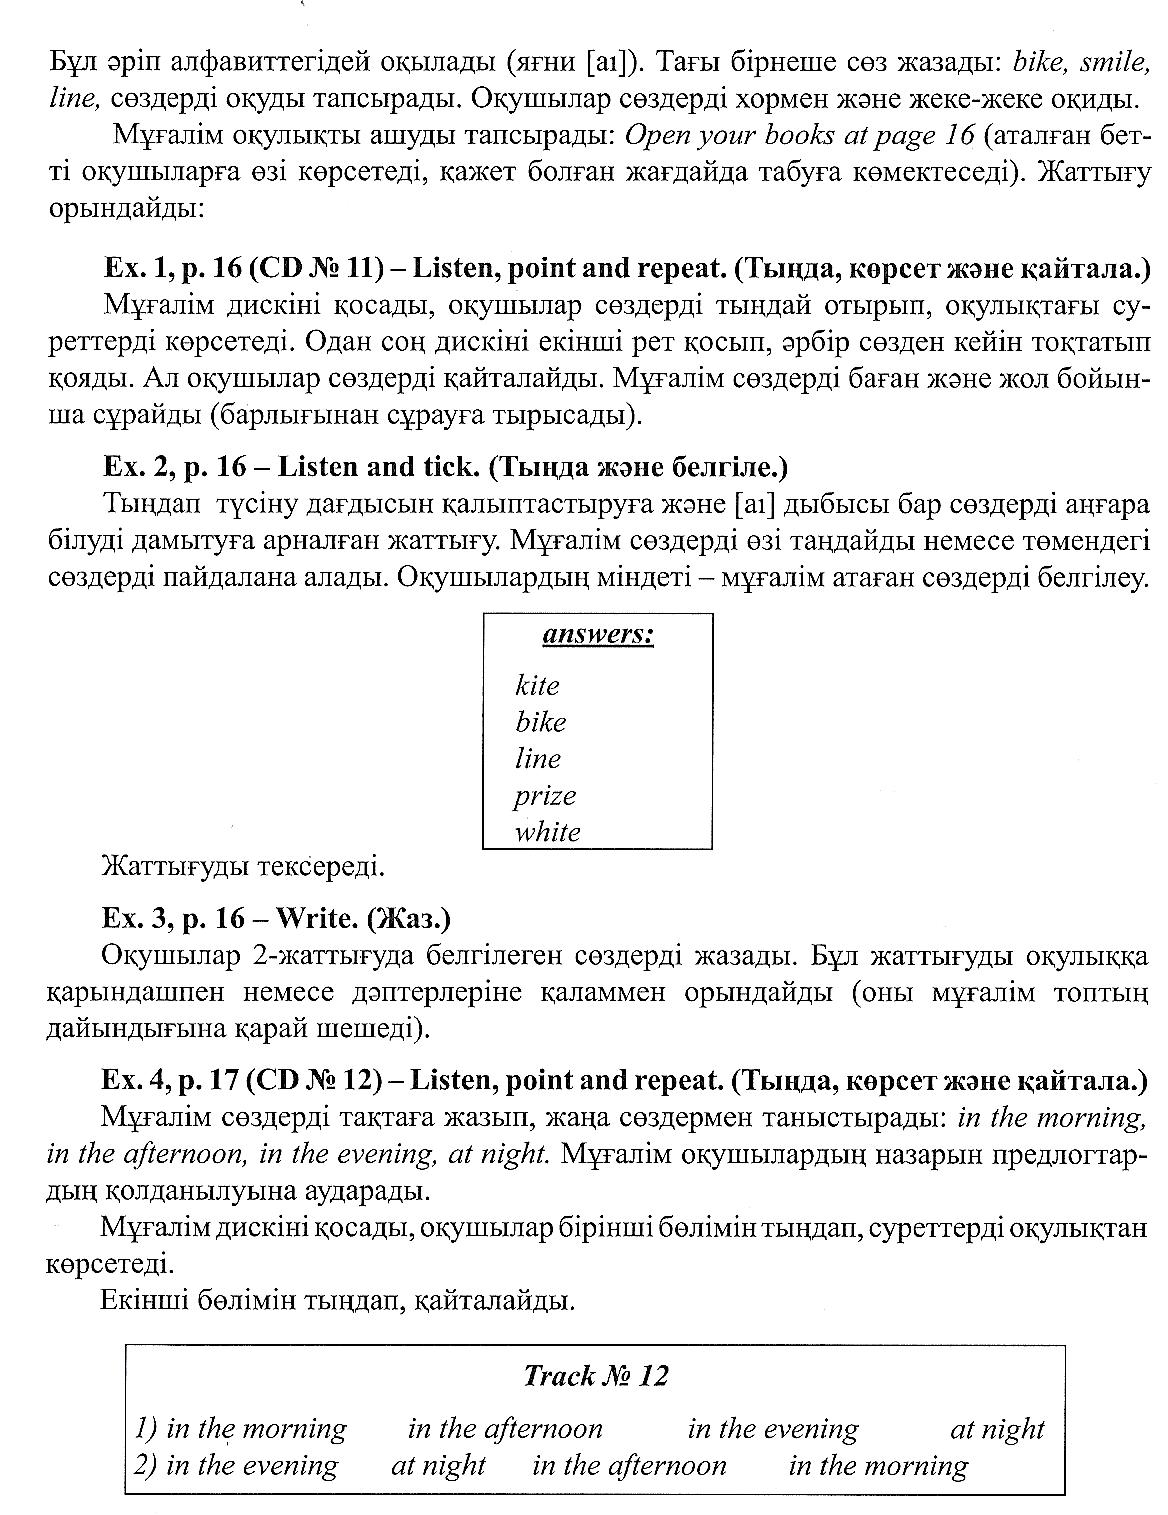 C:\Documents and Settings\User\Local Settings\Temporary Internet Files\Content.Word\сканирование0004.jpg